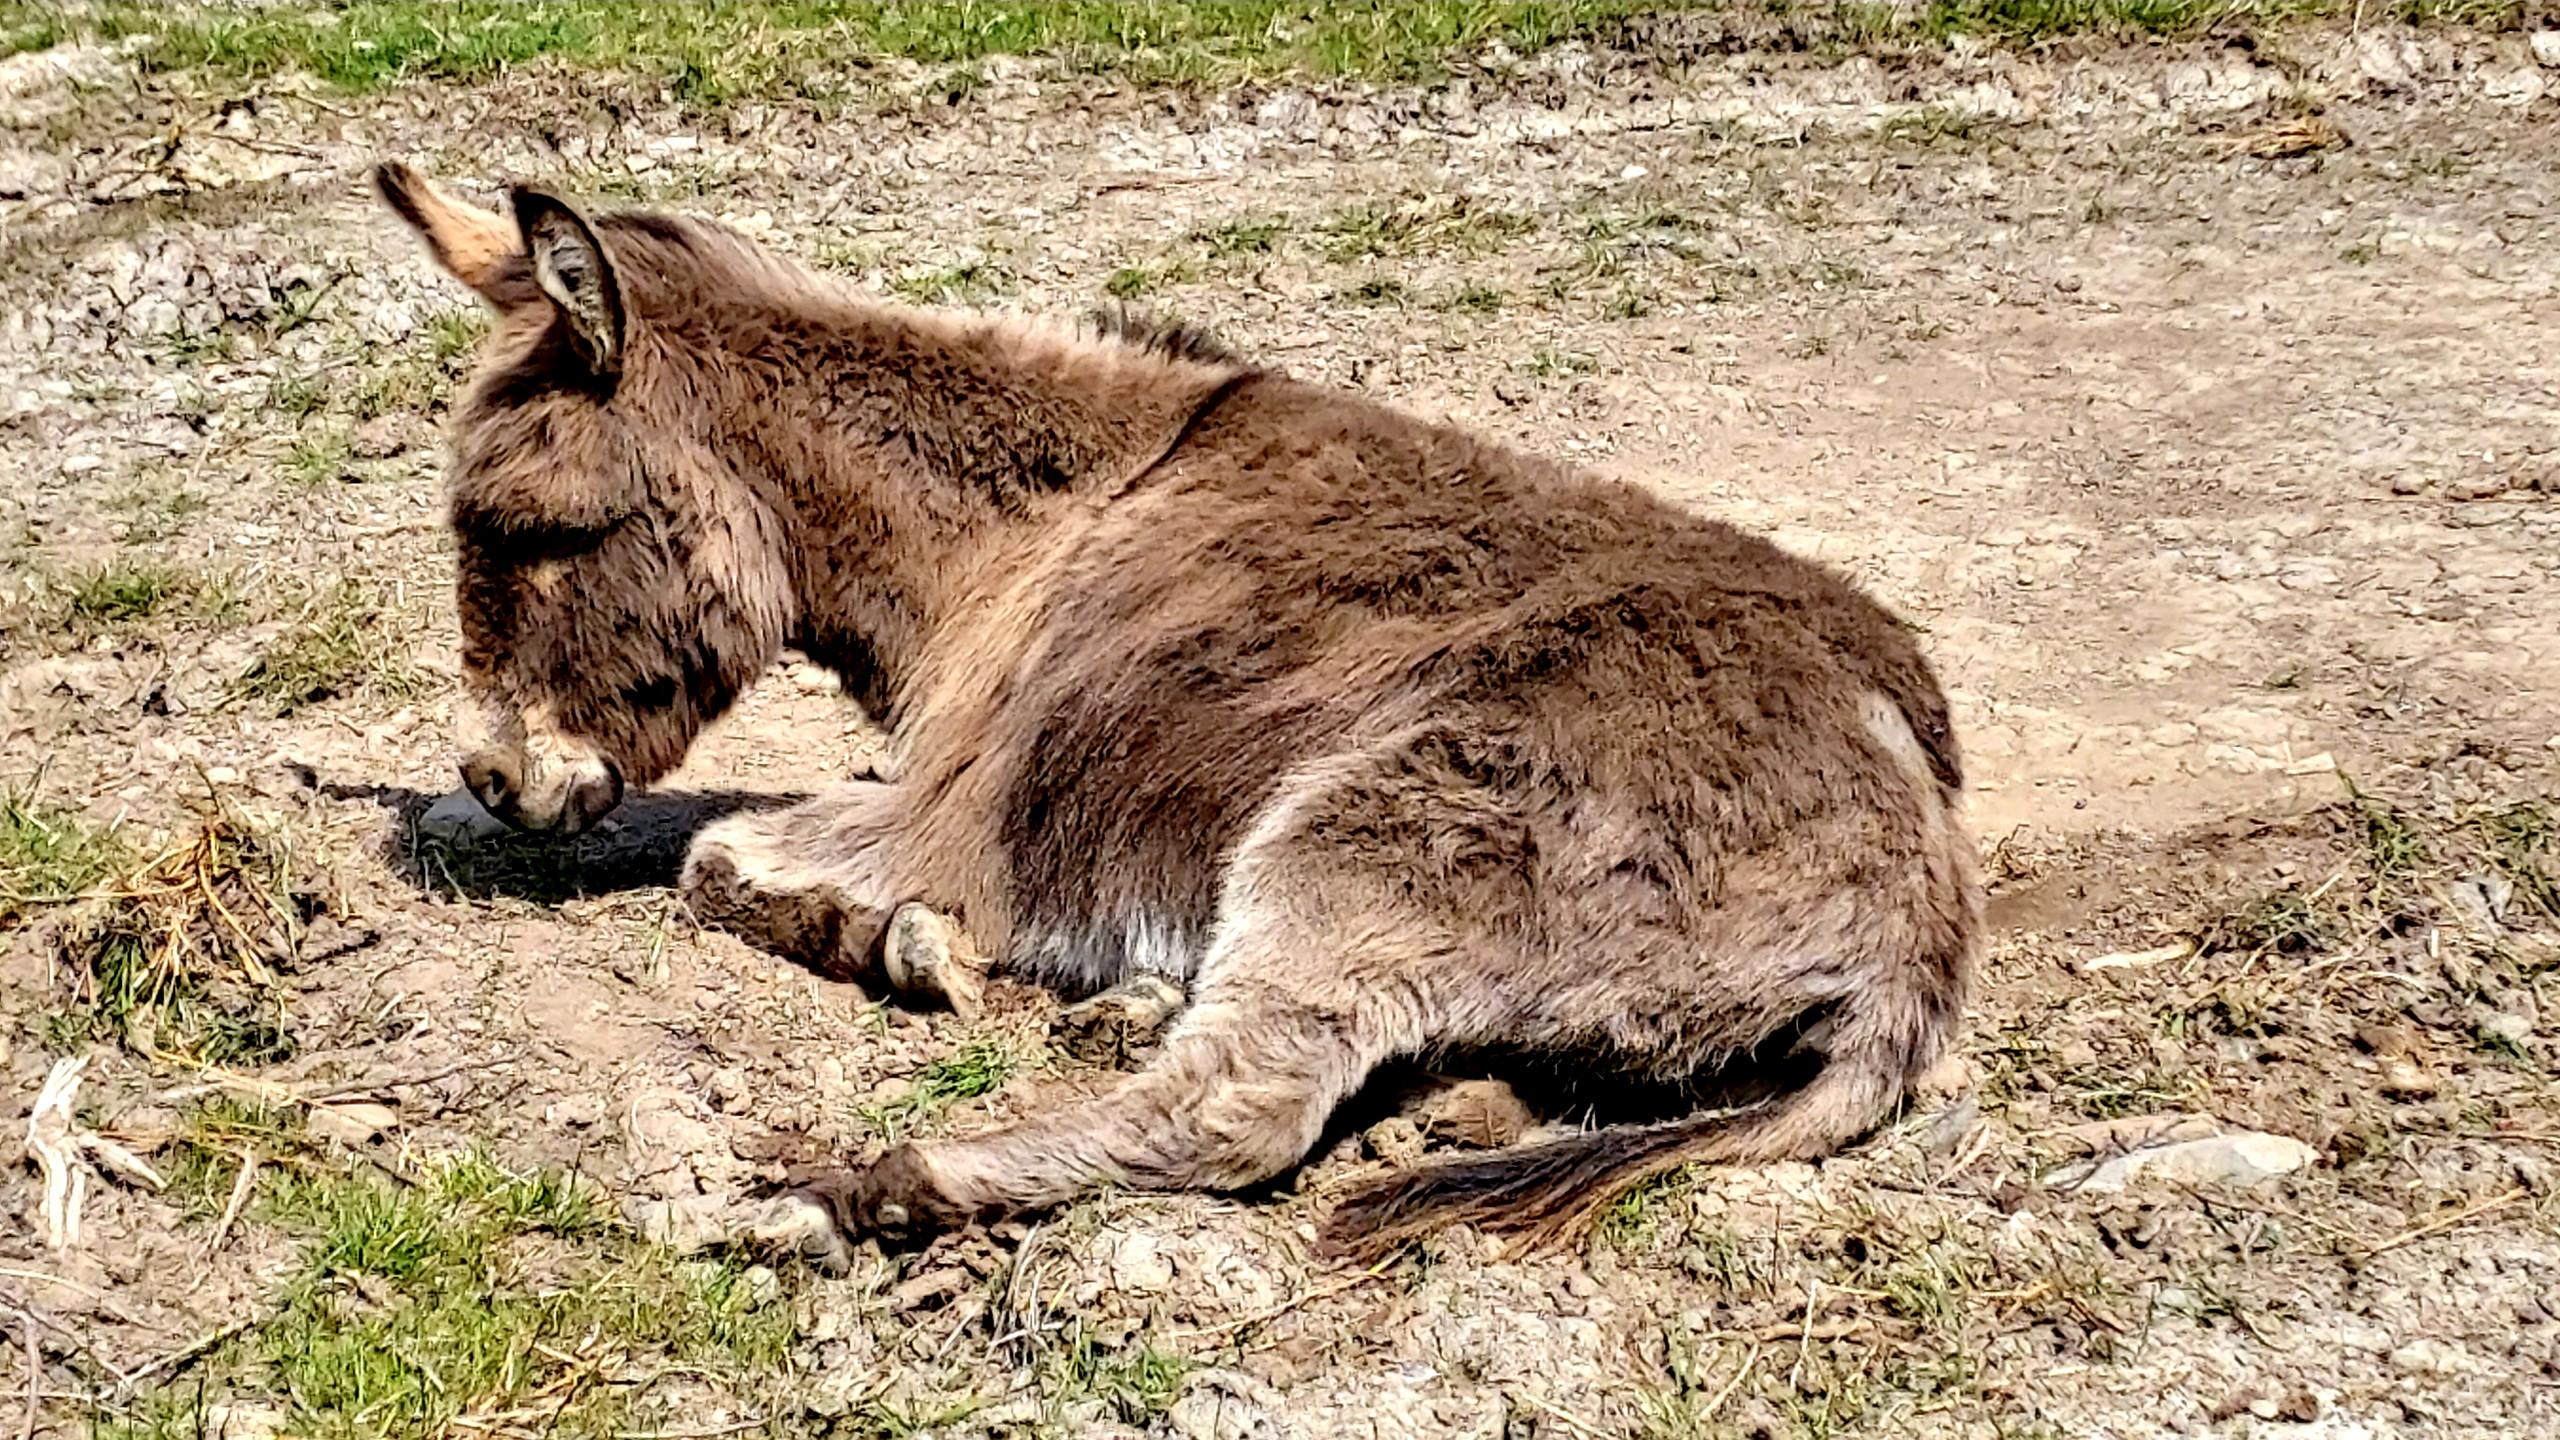 day-dreaming donkey